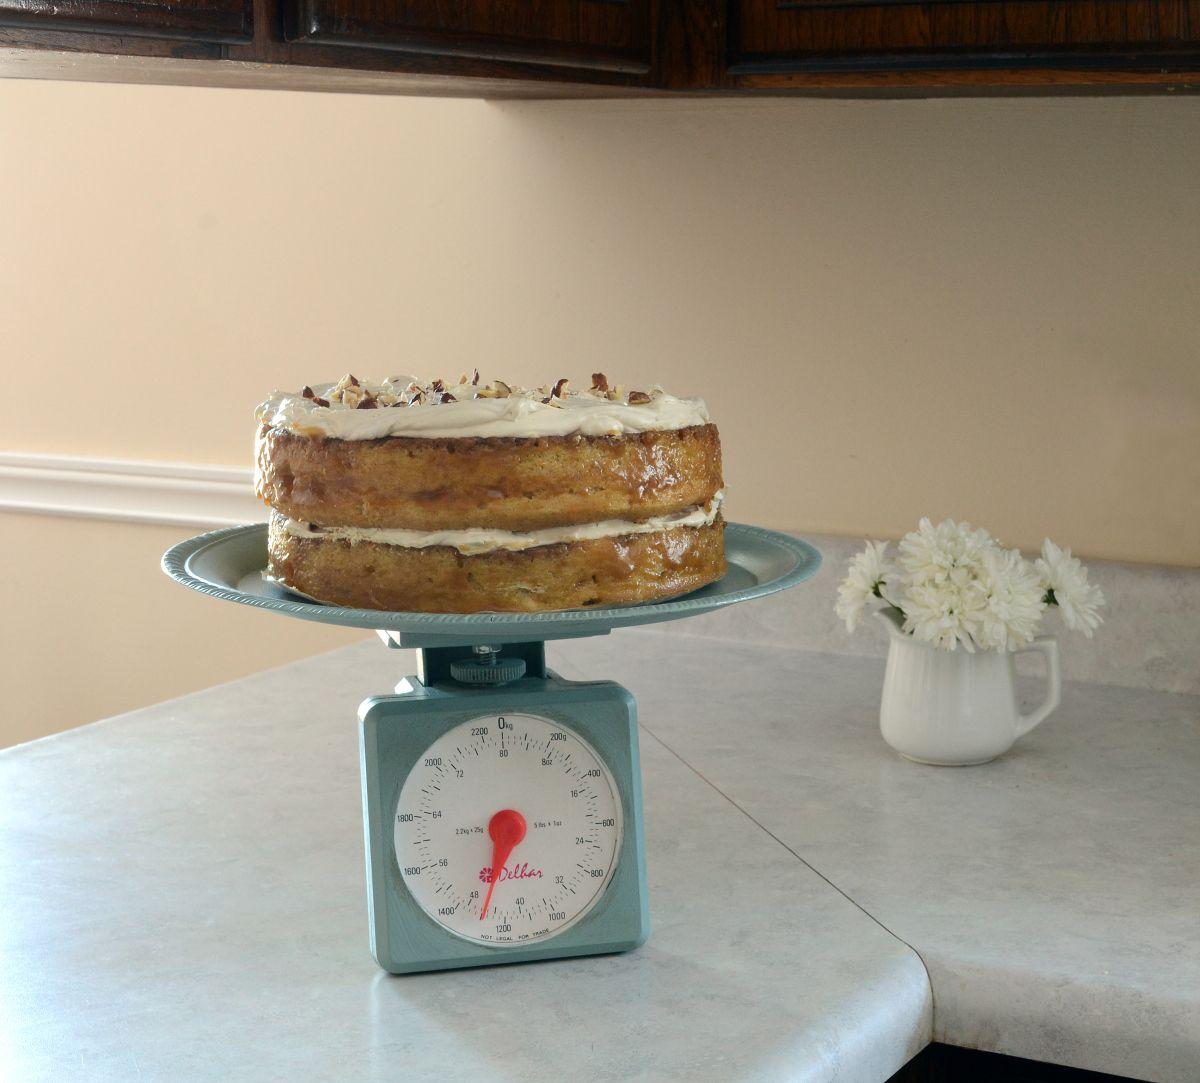 DIY Kitchen Scale Dessert Stand: OUR HOMES MAGAZINE